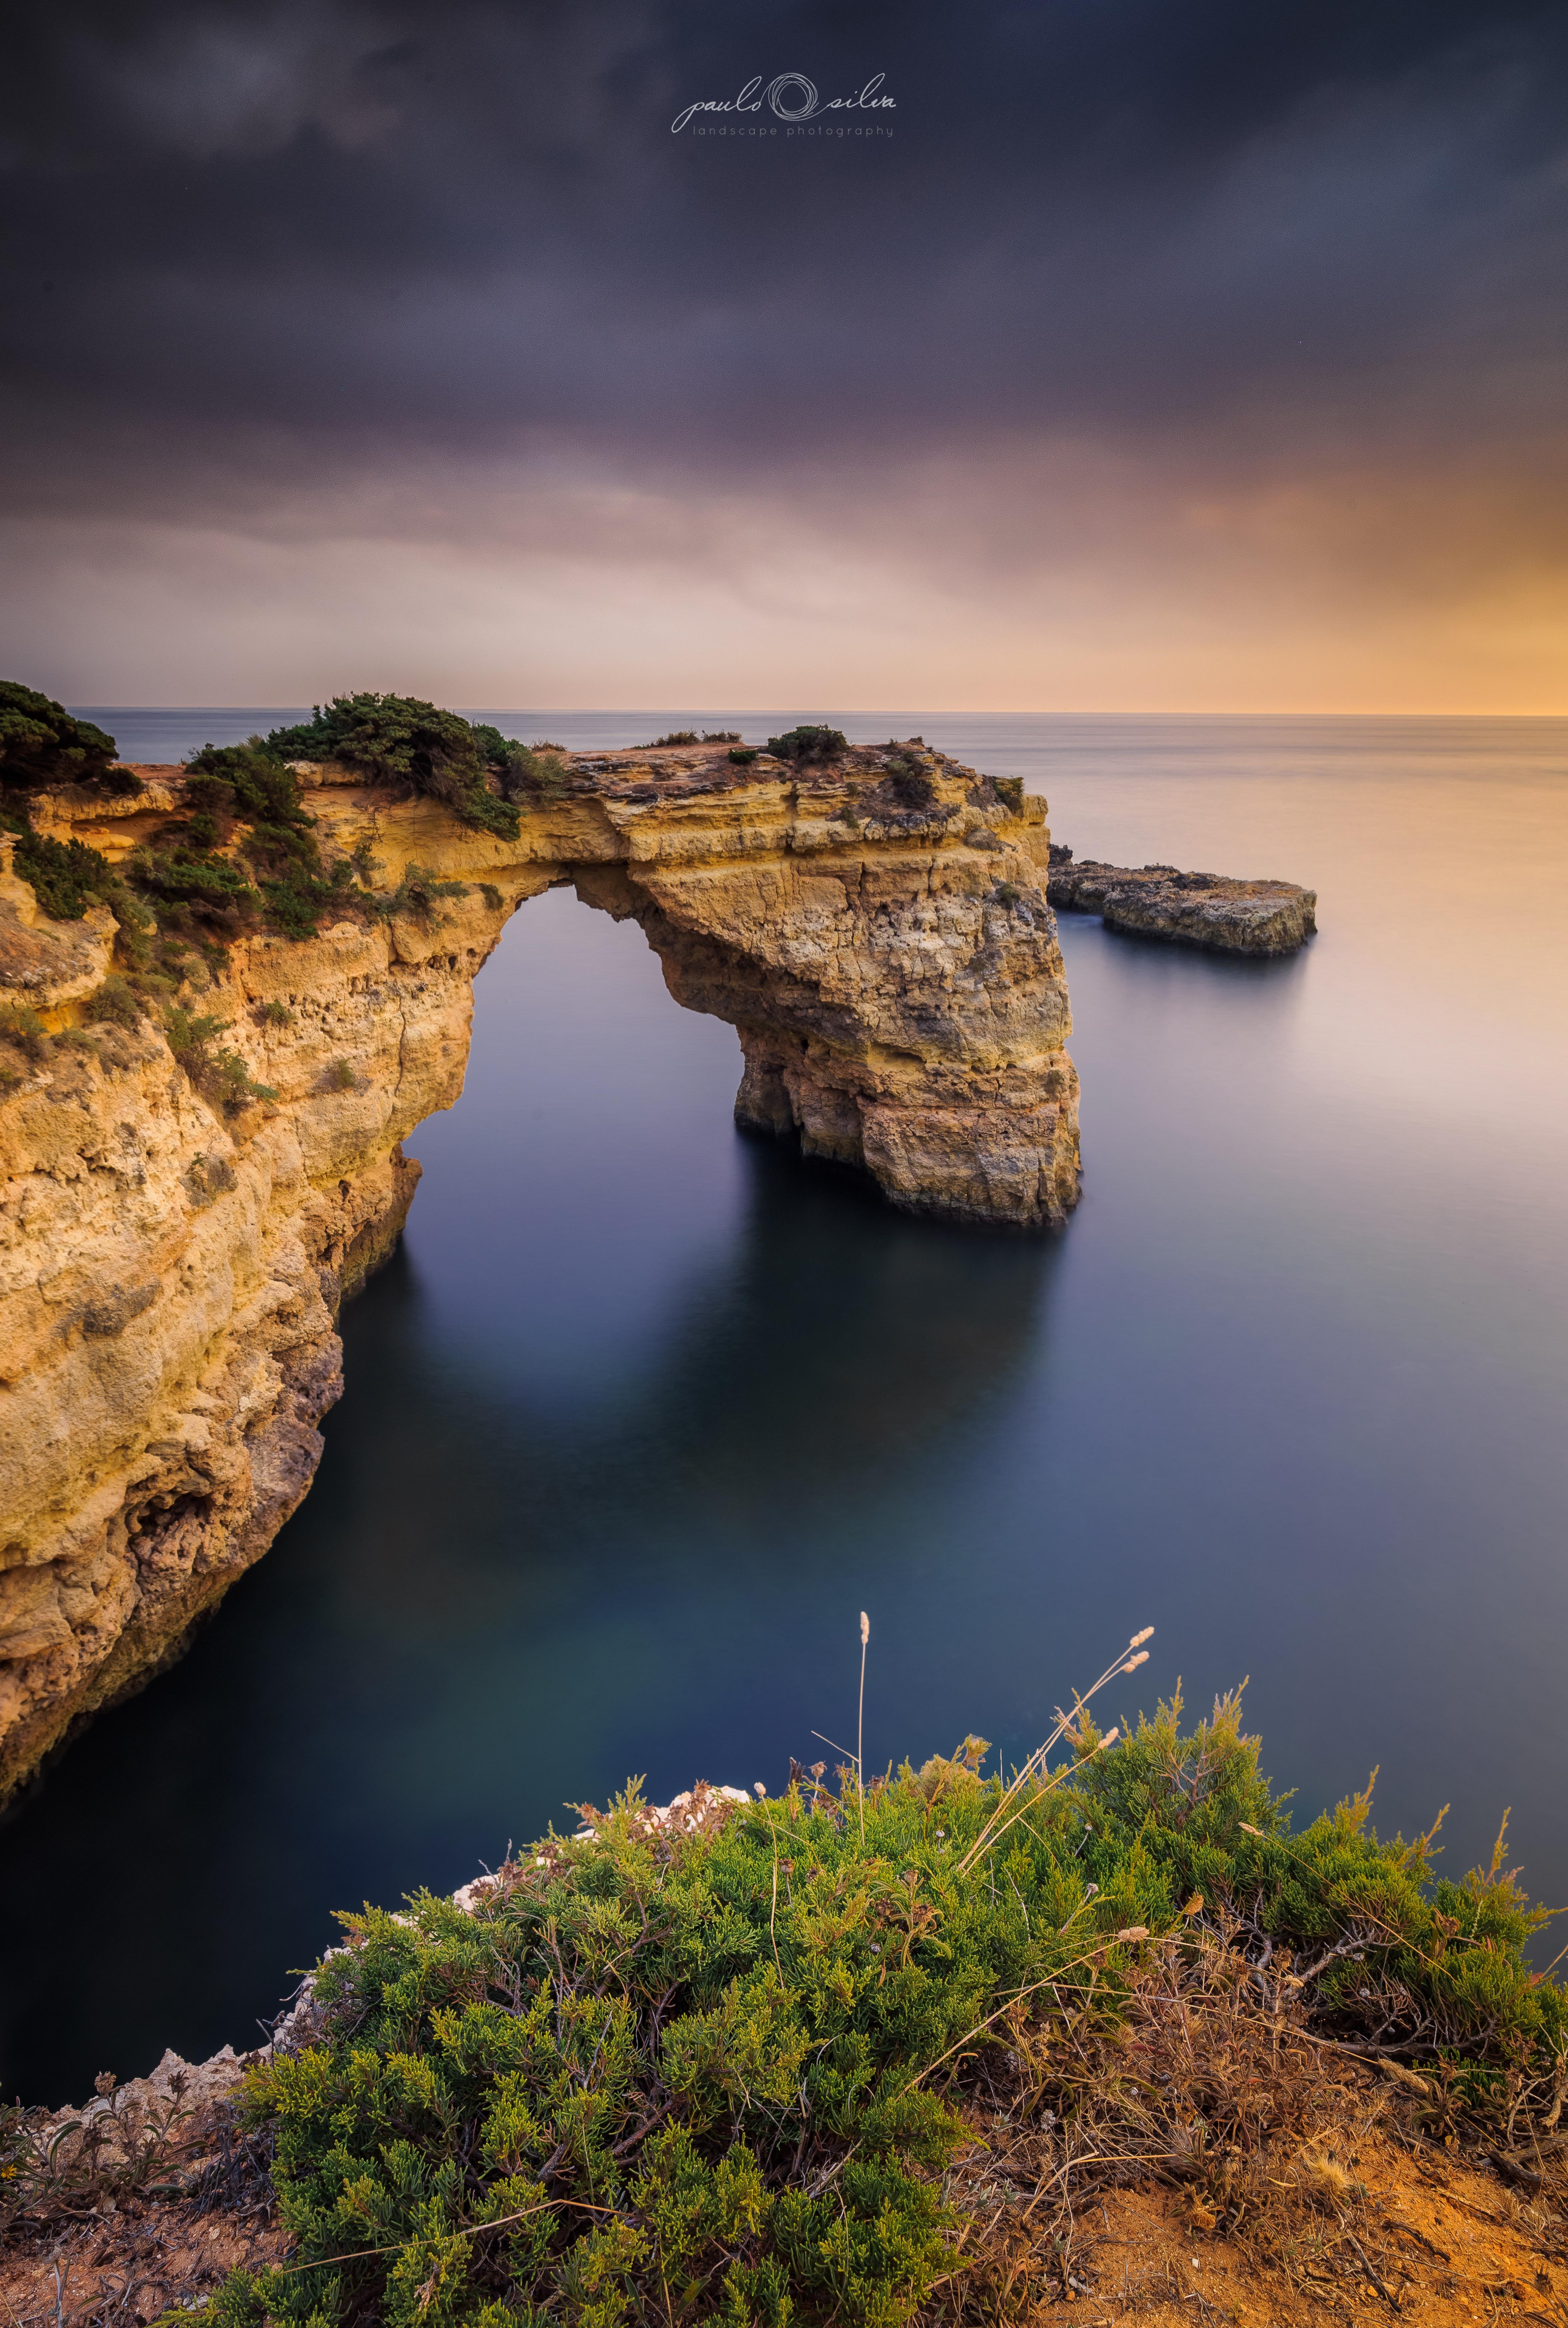 Sunset at Albandeira, Algarve - Portugal